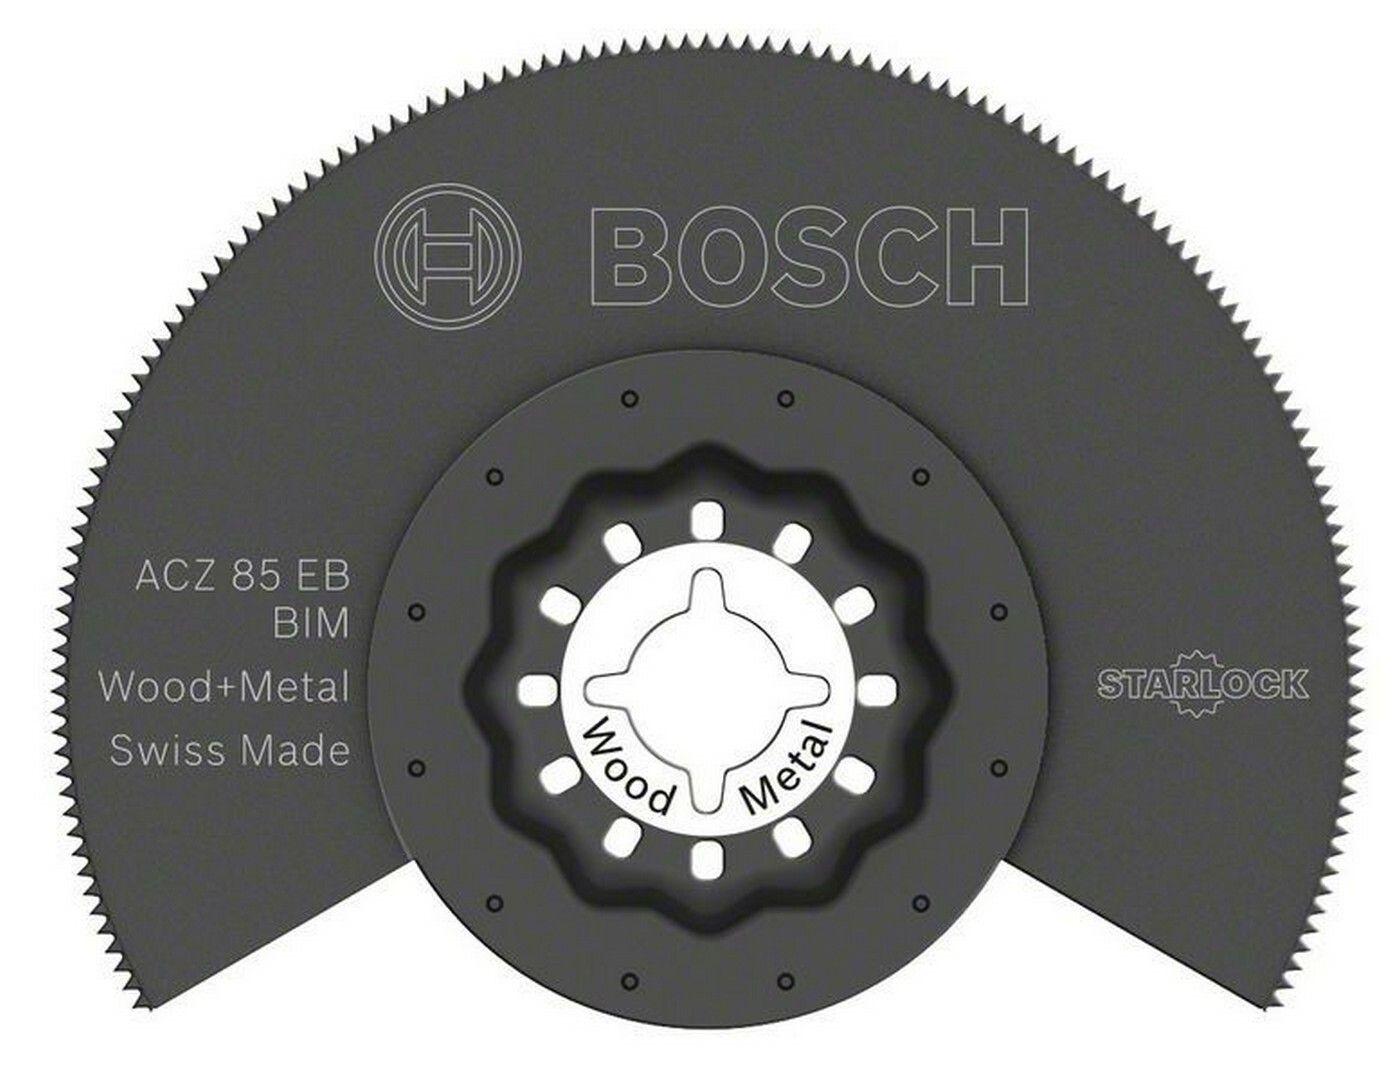 BIM segmentový pilový kotouč ACZ 85 EB Wood and Metal - 85 mm - 3165140492393 BOSCH